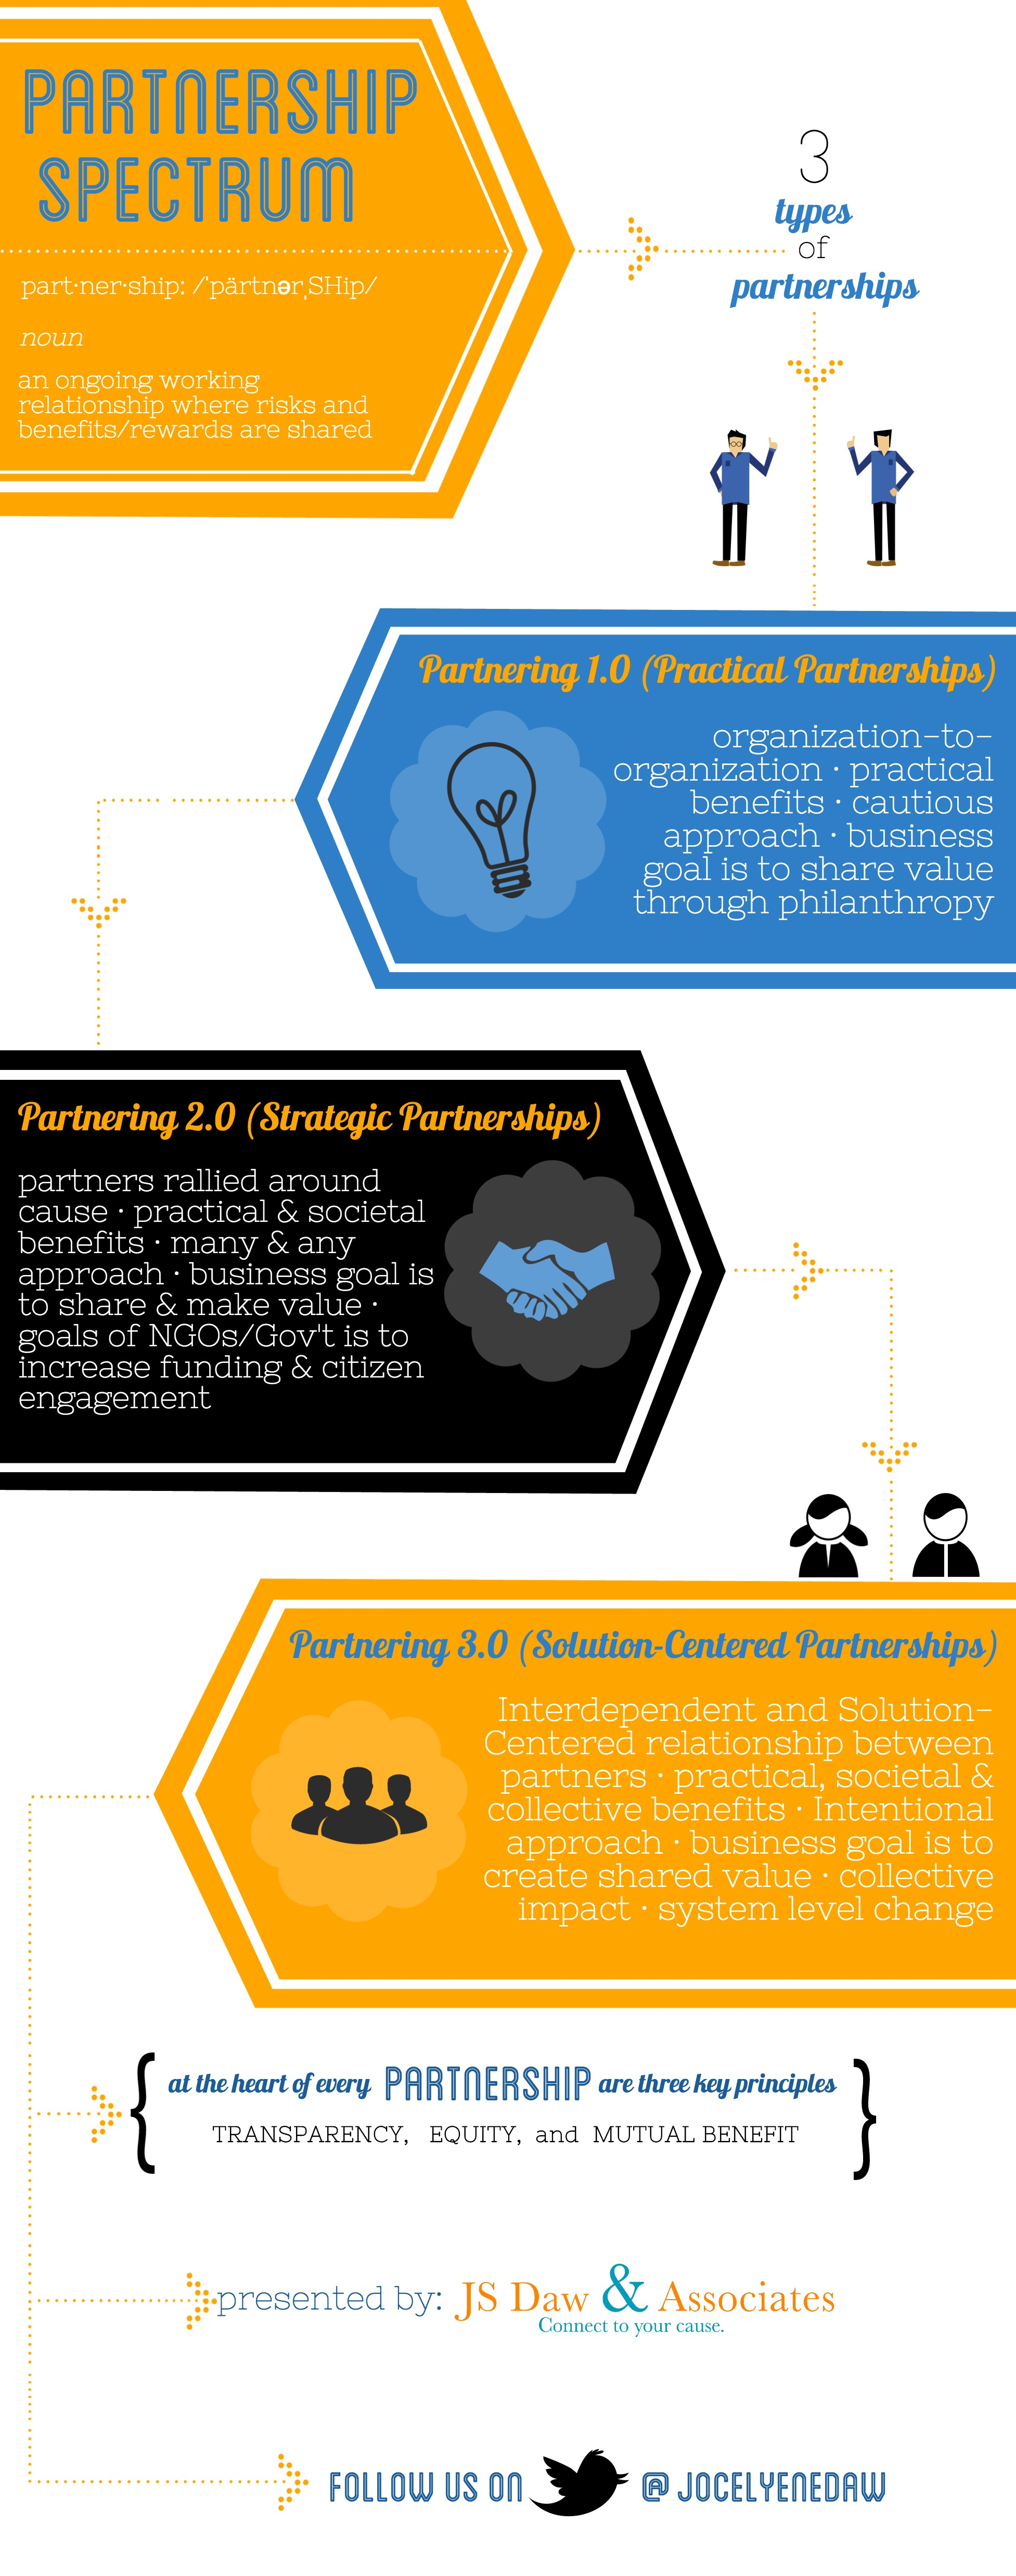 Partnership spectrum (2)